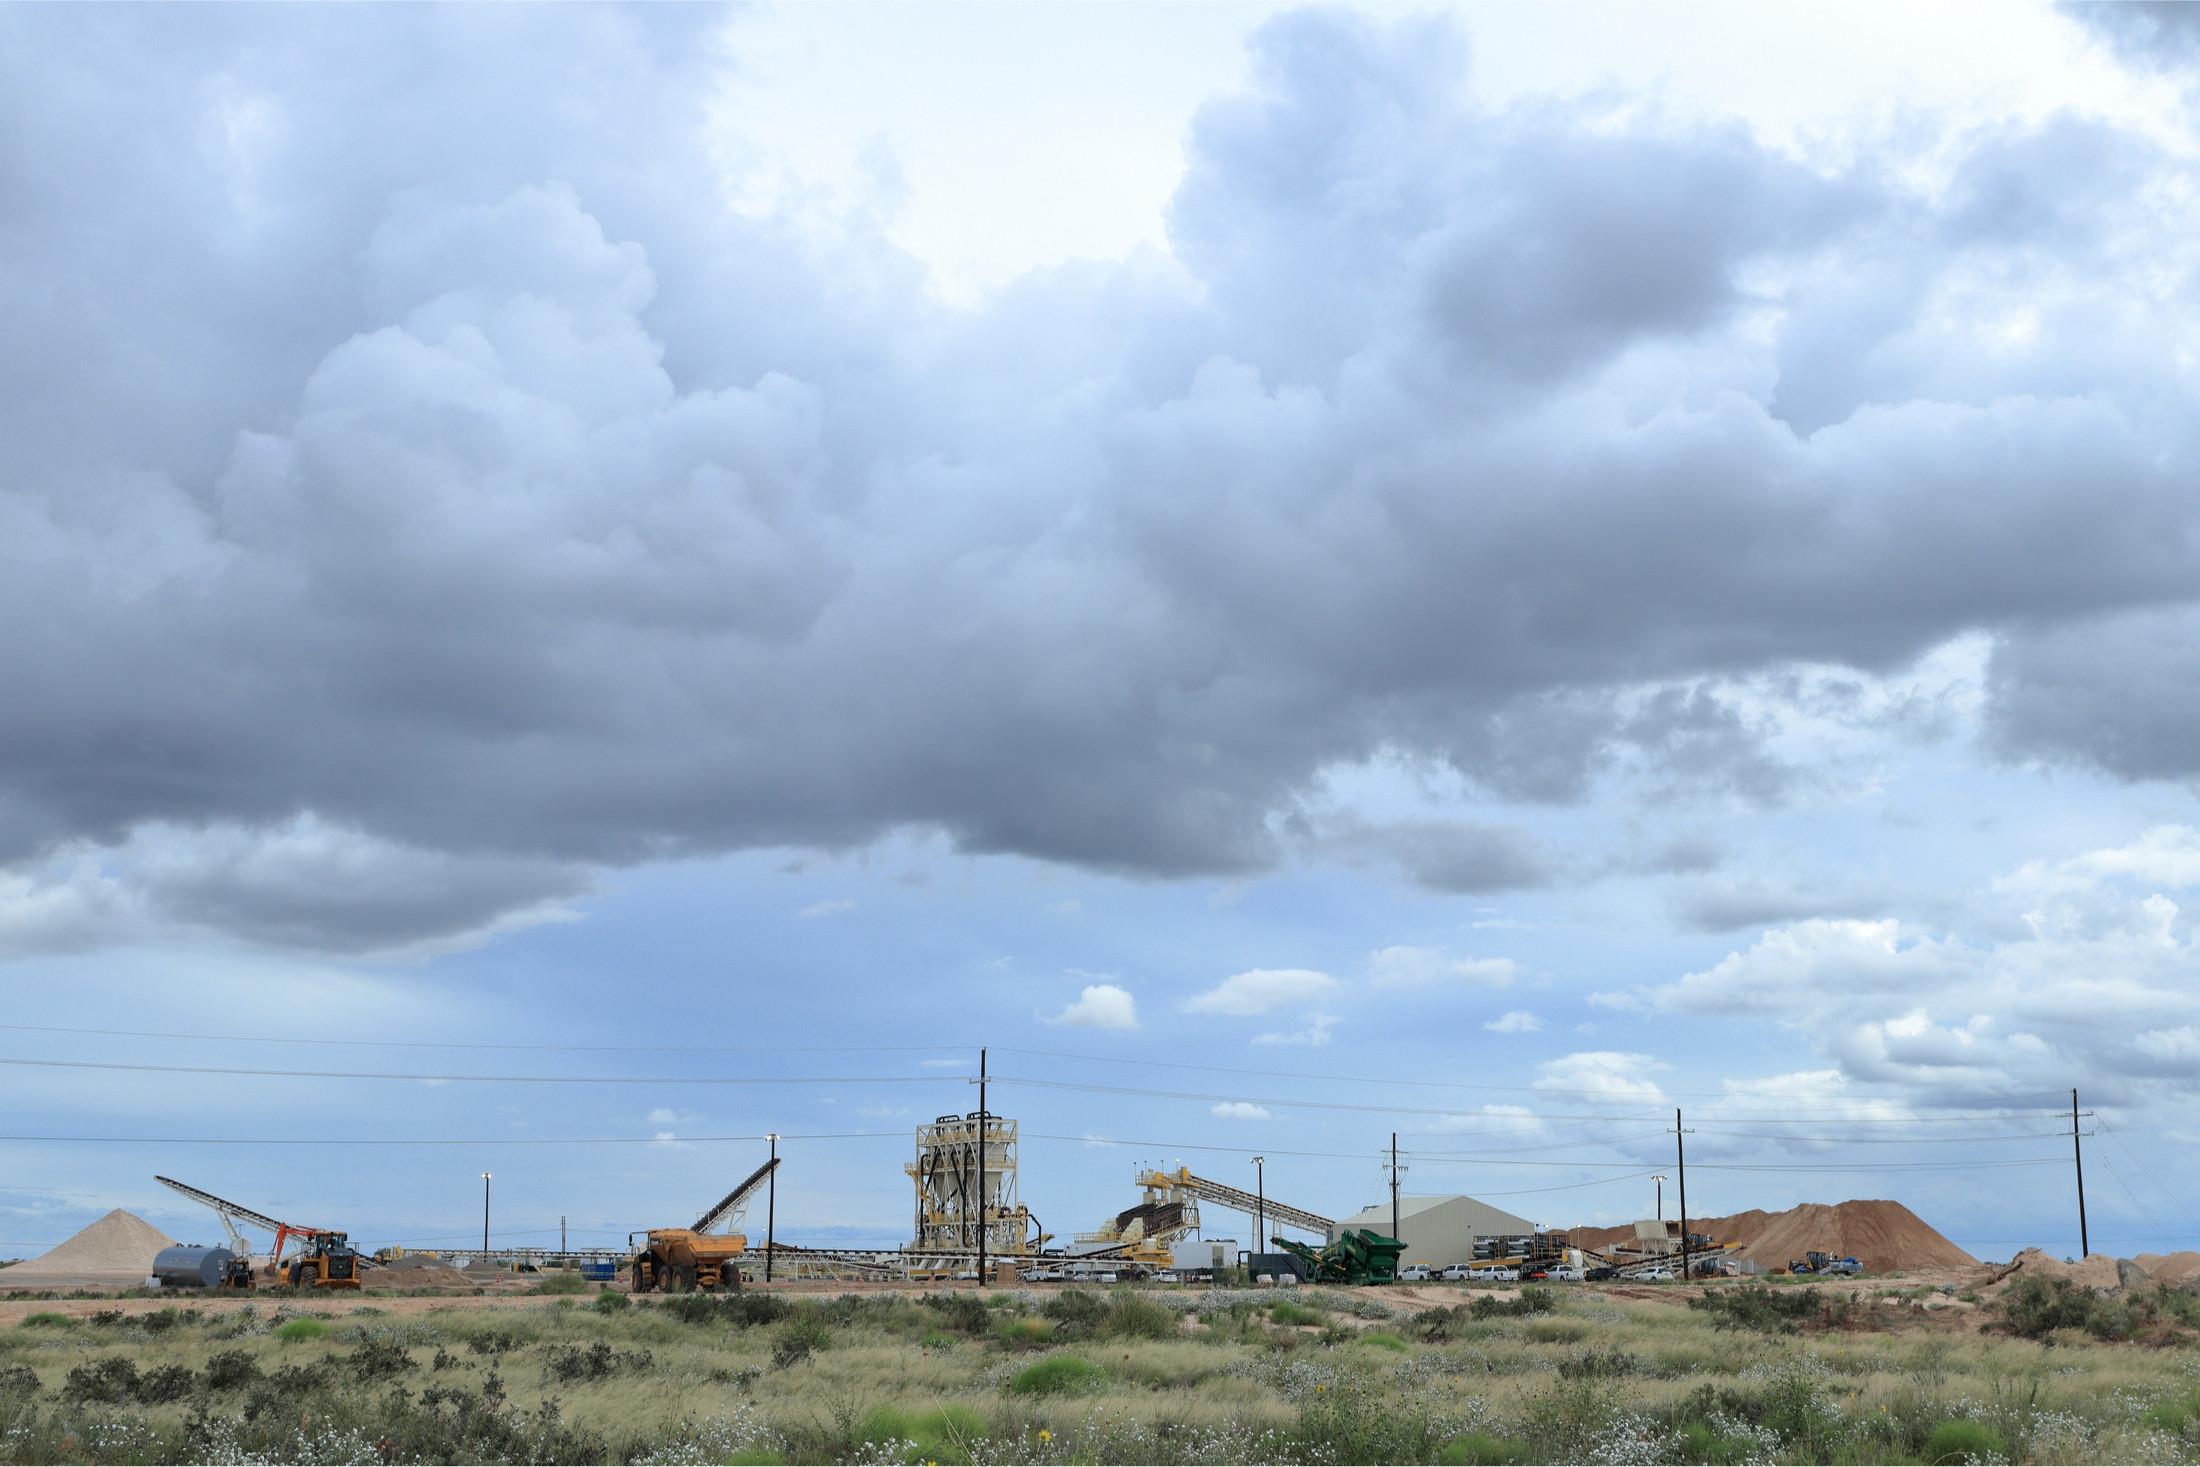 Mining frac sand in West Texas.